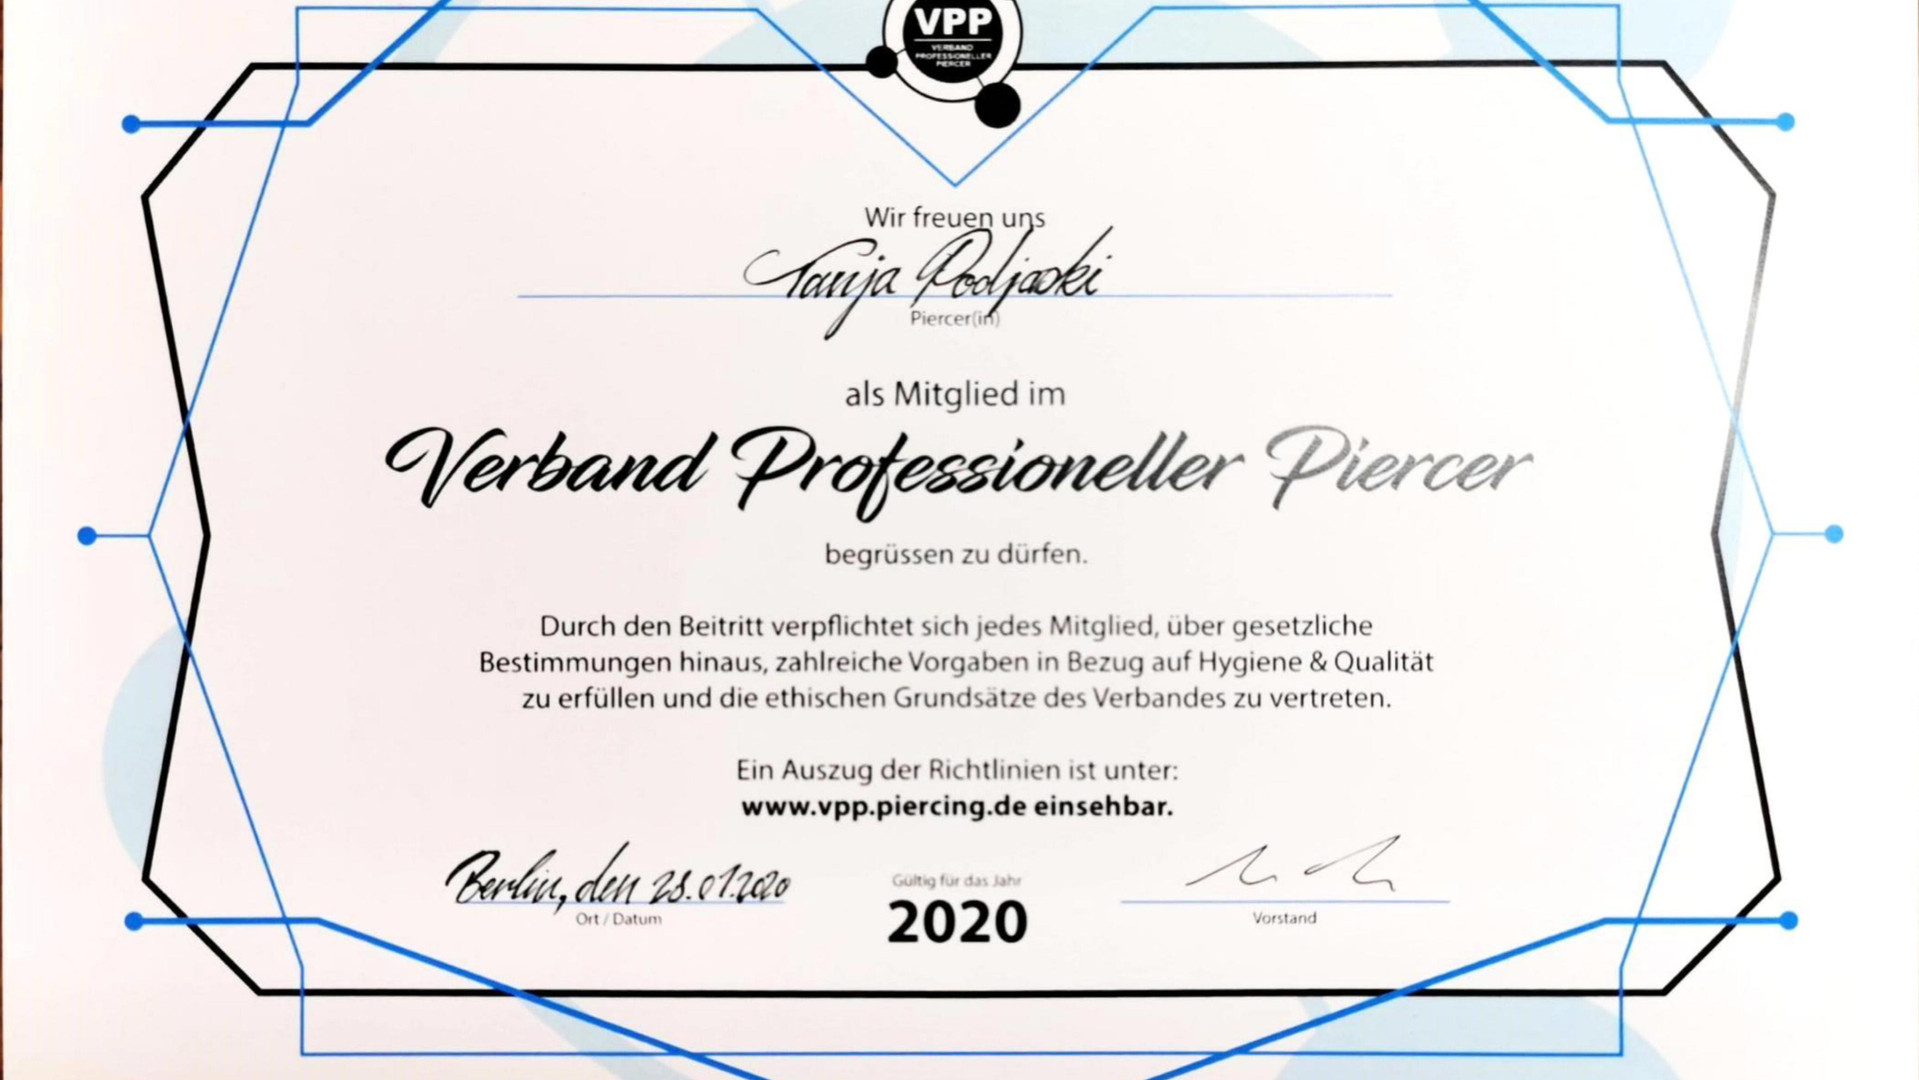 Verband Professioneller Piercer 2020 - Tanja